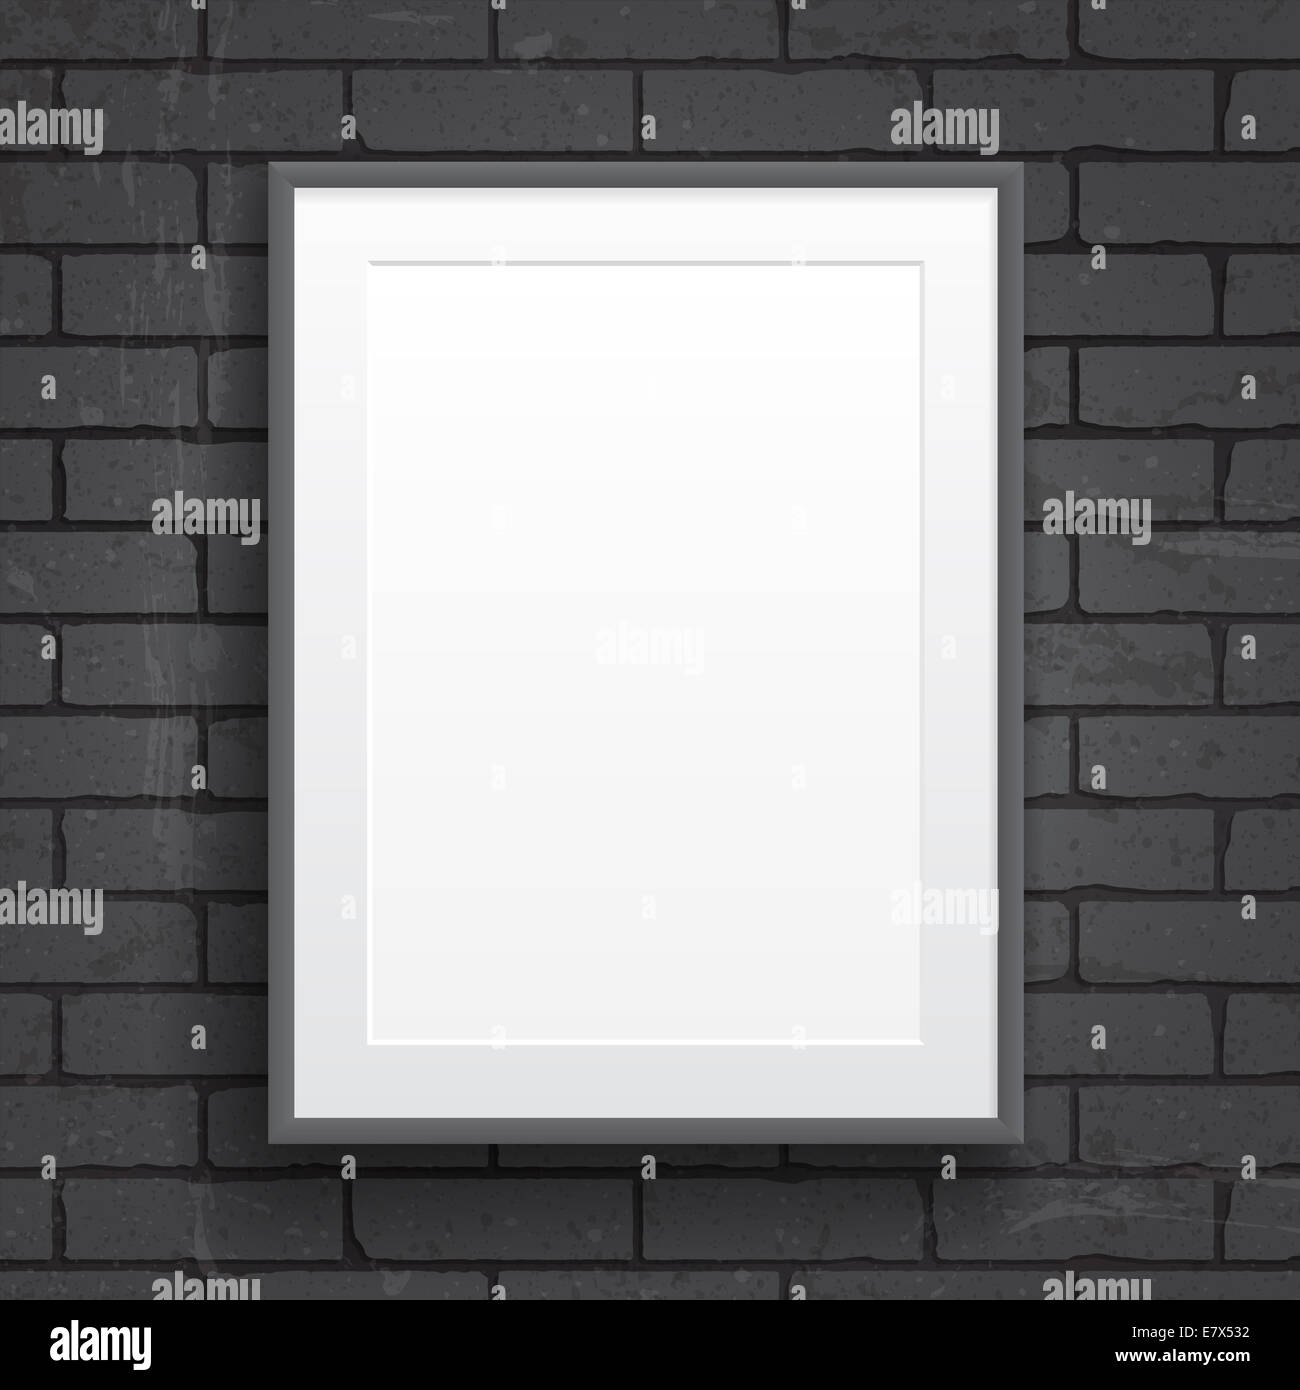 Paper Poster Stockfotos & Paper Poster Bilder - Alamy